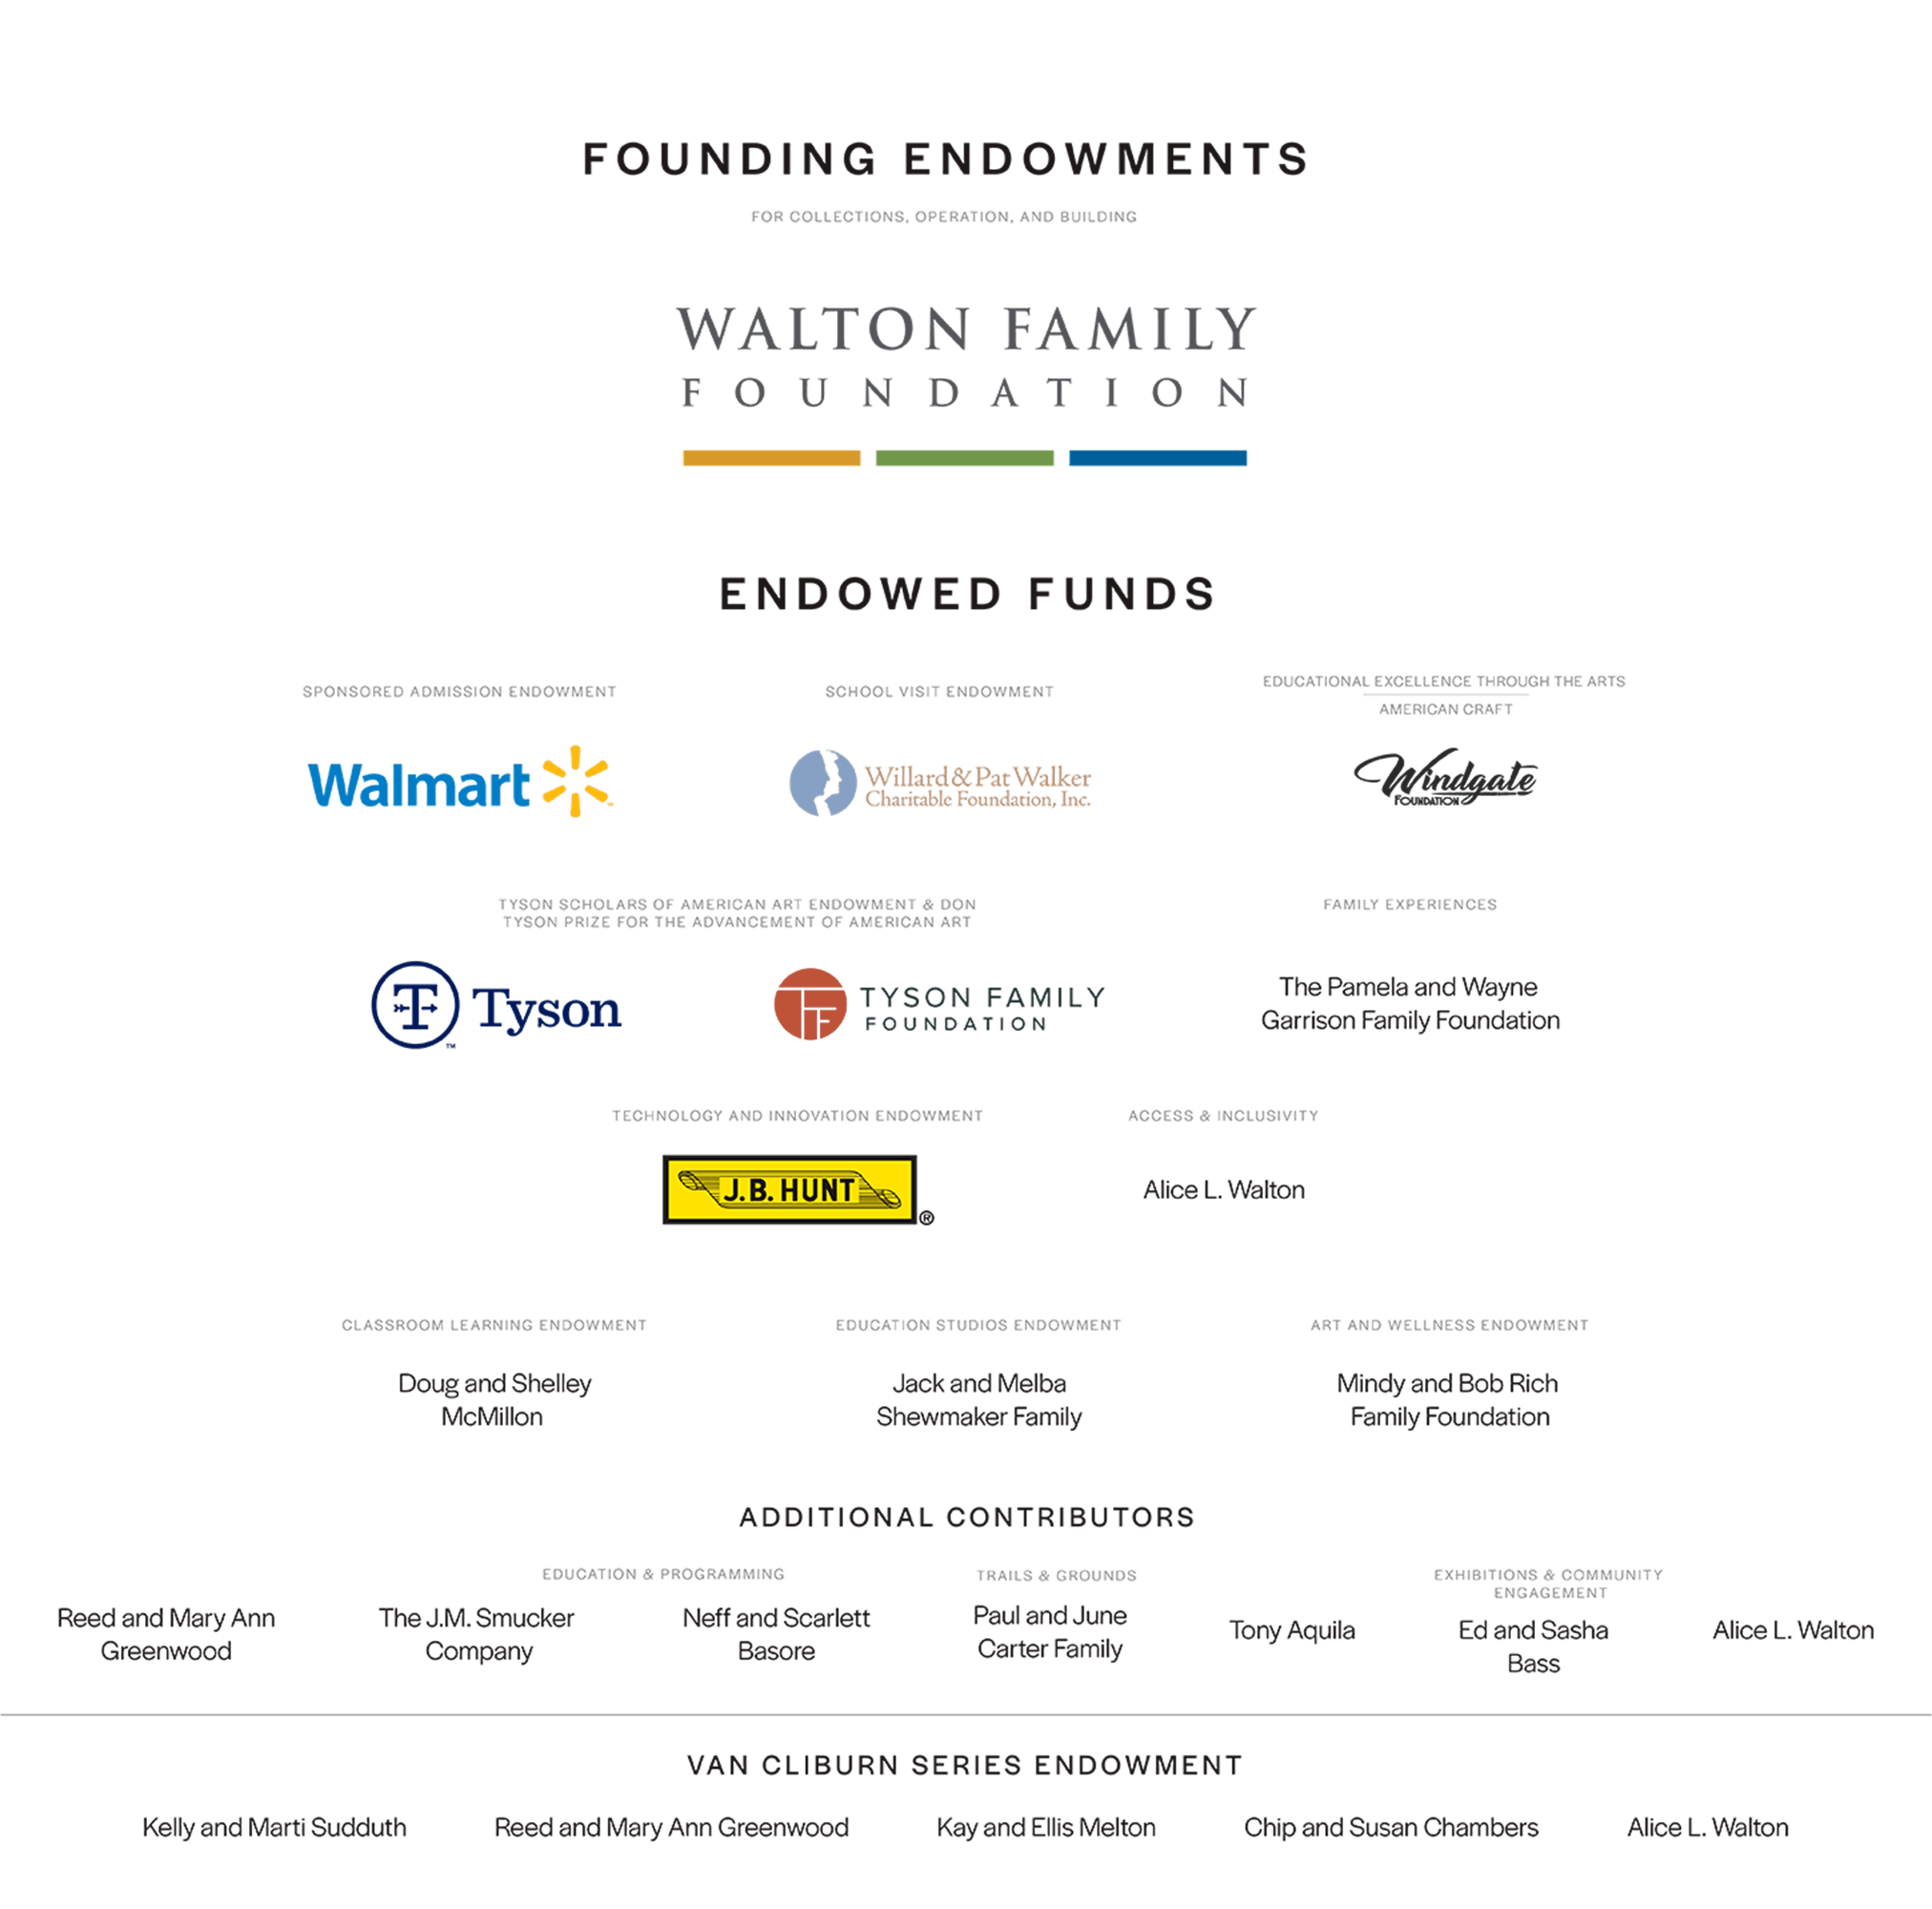 2021 endowment sponsors